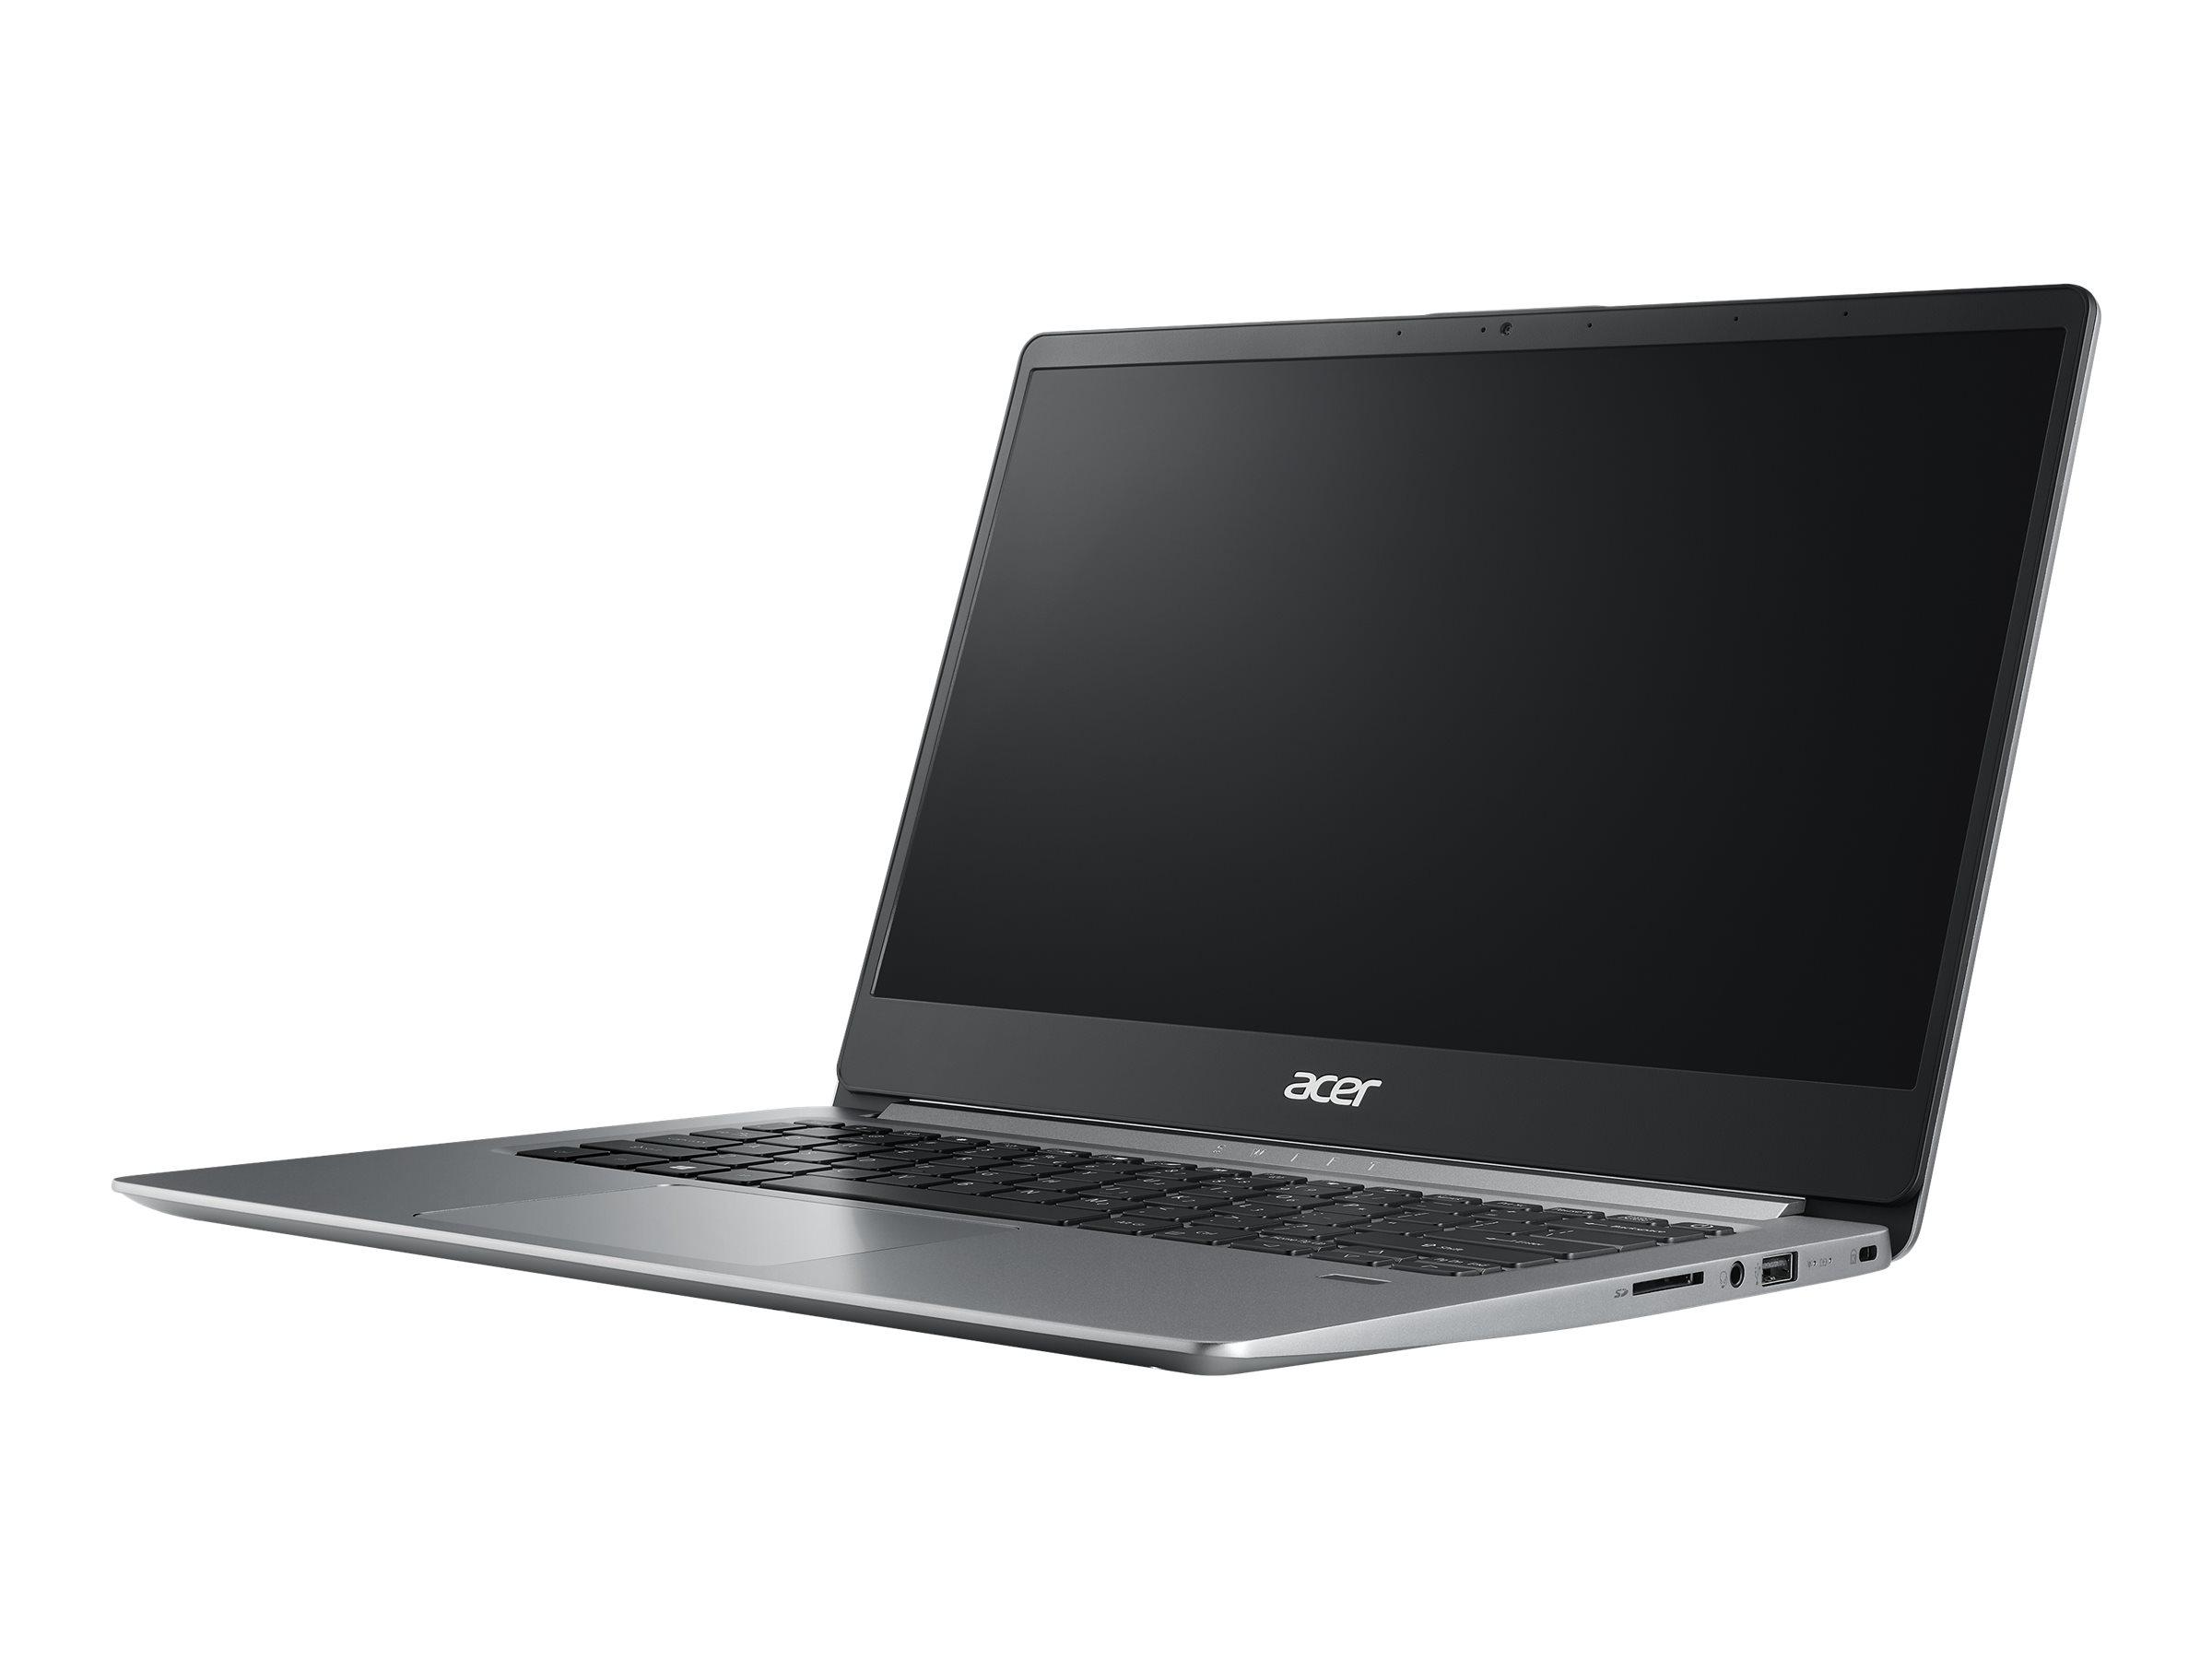 "Acer Swift 1 SF114-32-P57N - Pentium Silver N5000 / 1.1 GHz - Win 10 Home 64-Bit - 4 GB RAM - 128 GB SSD - 35.6 cm (14"")"